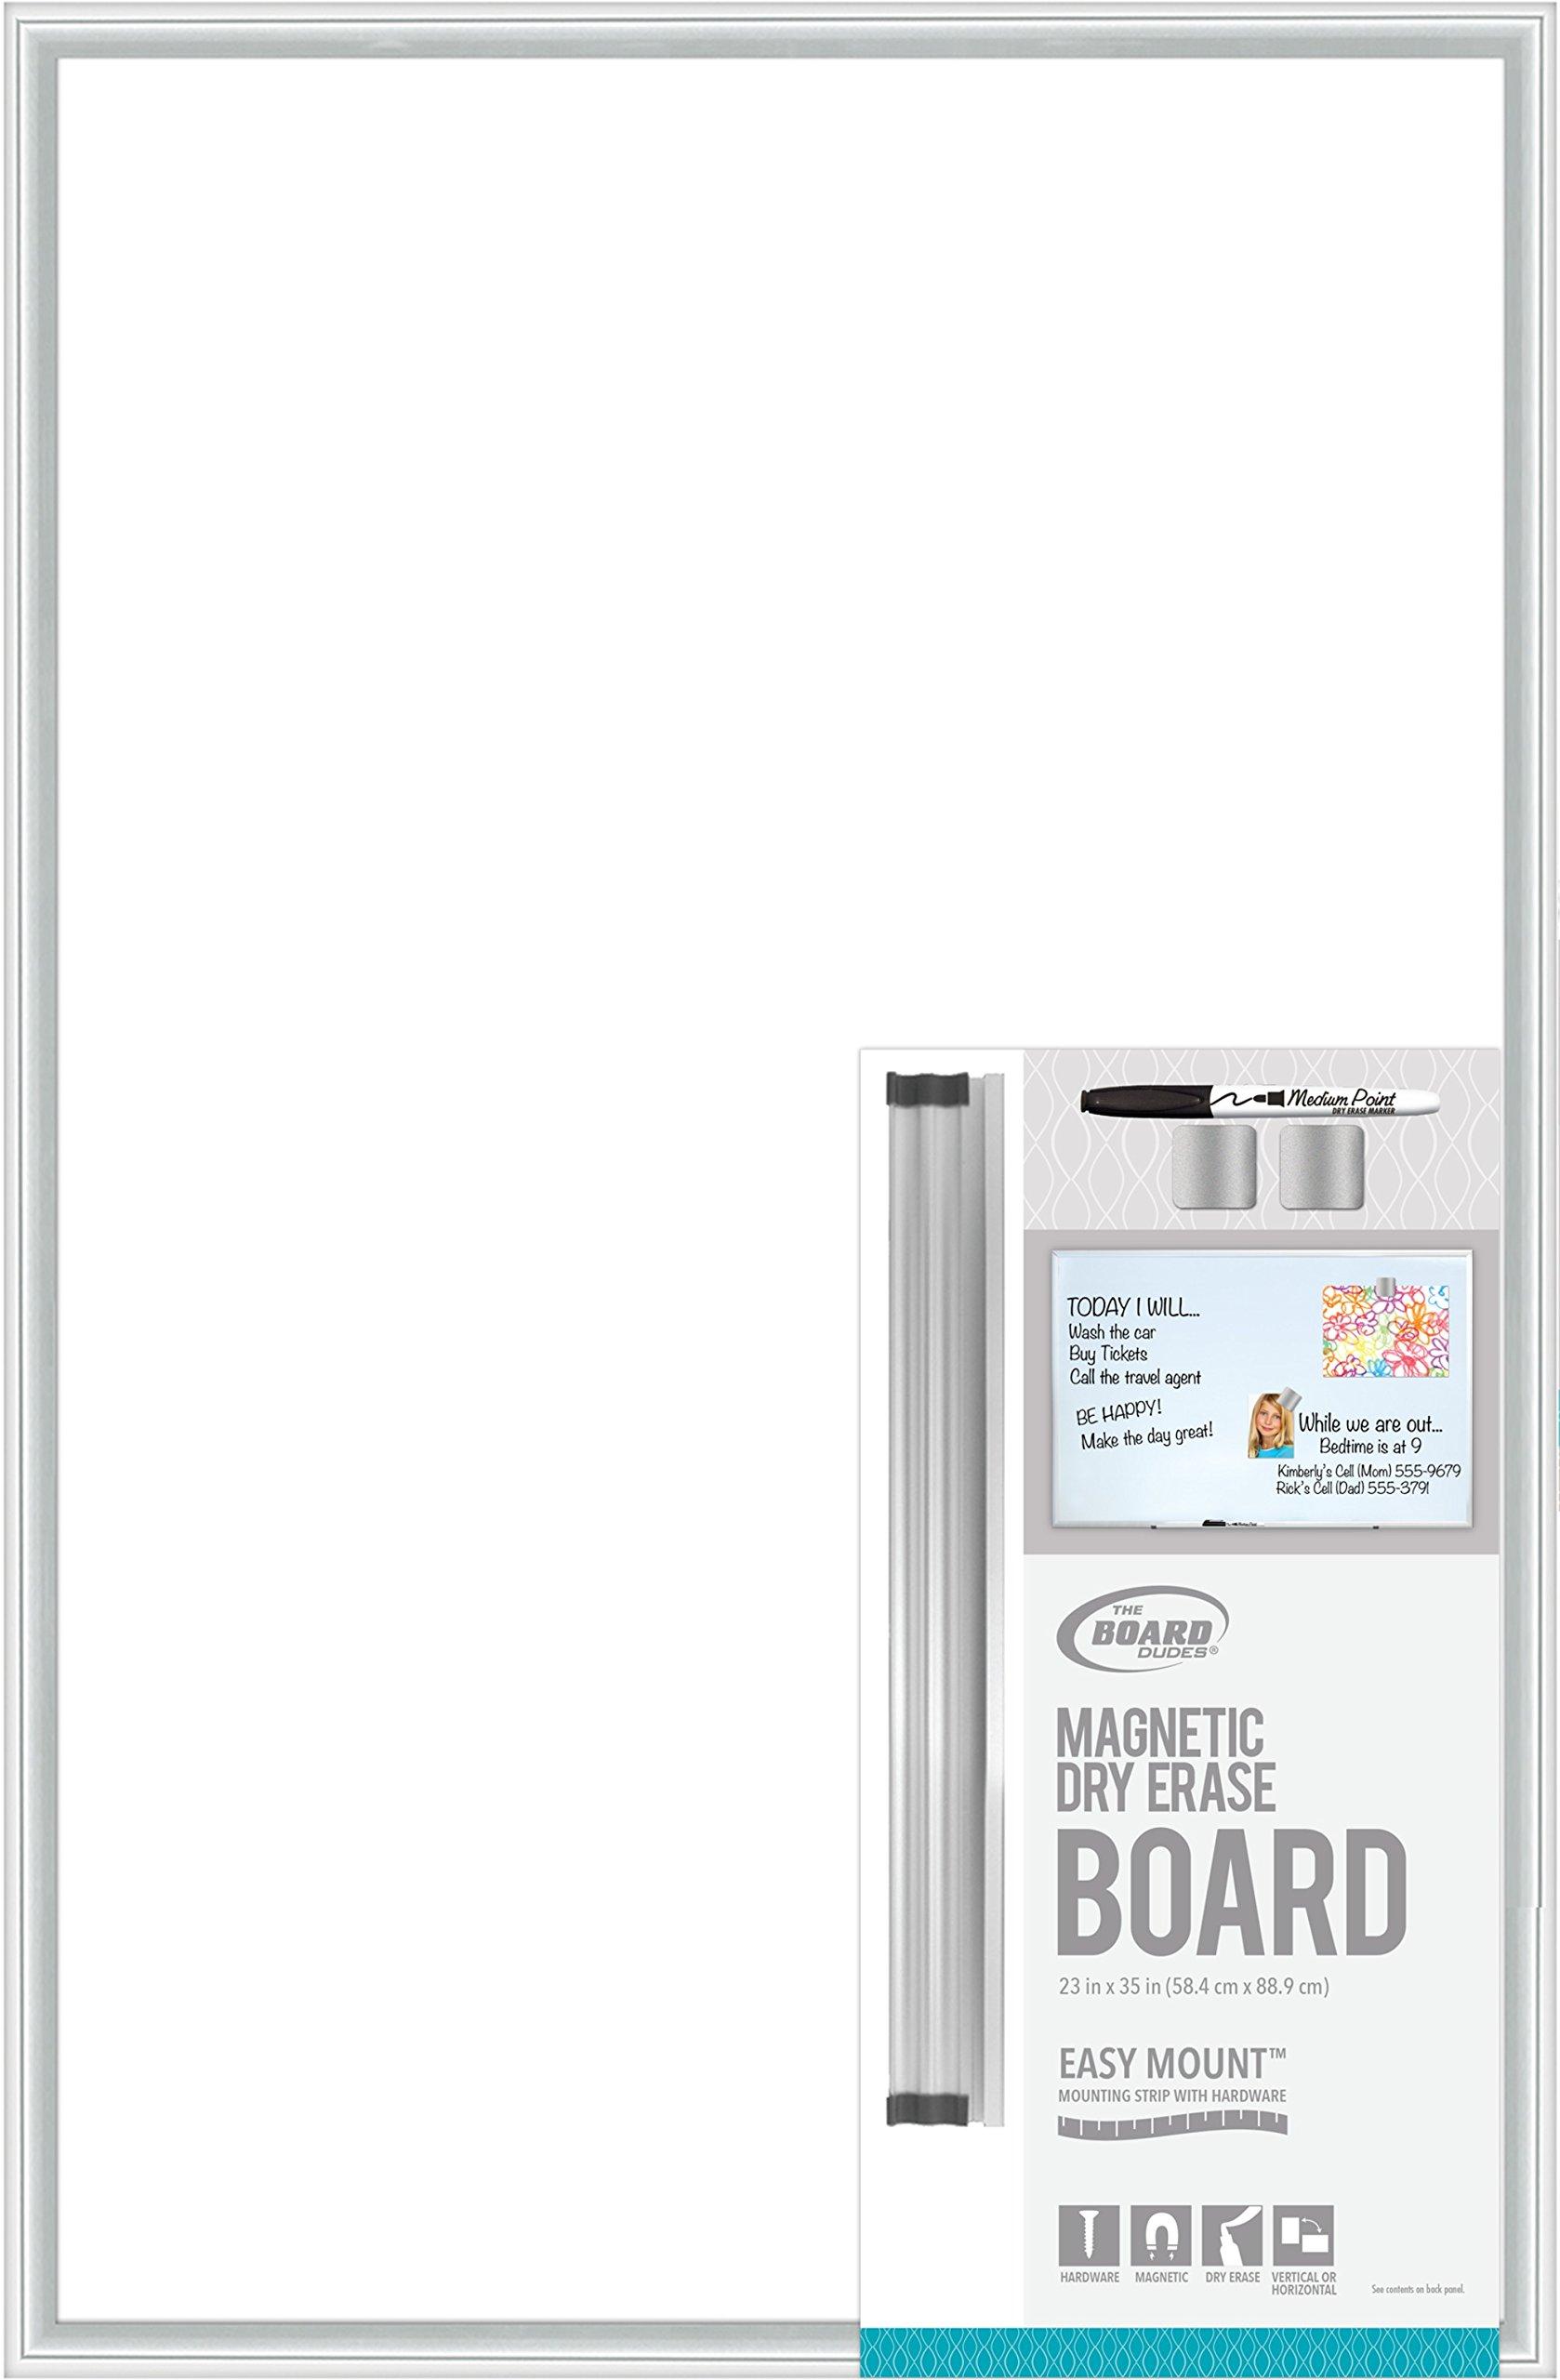 Board Dudes Magnetic Dry Erase Aluminum framed board 35 x23